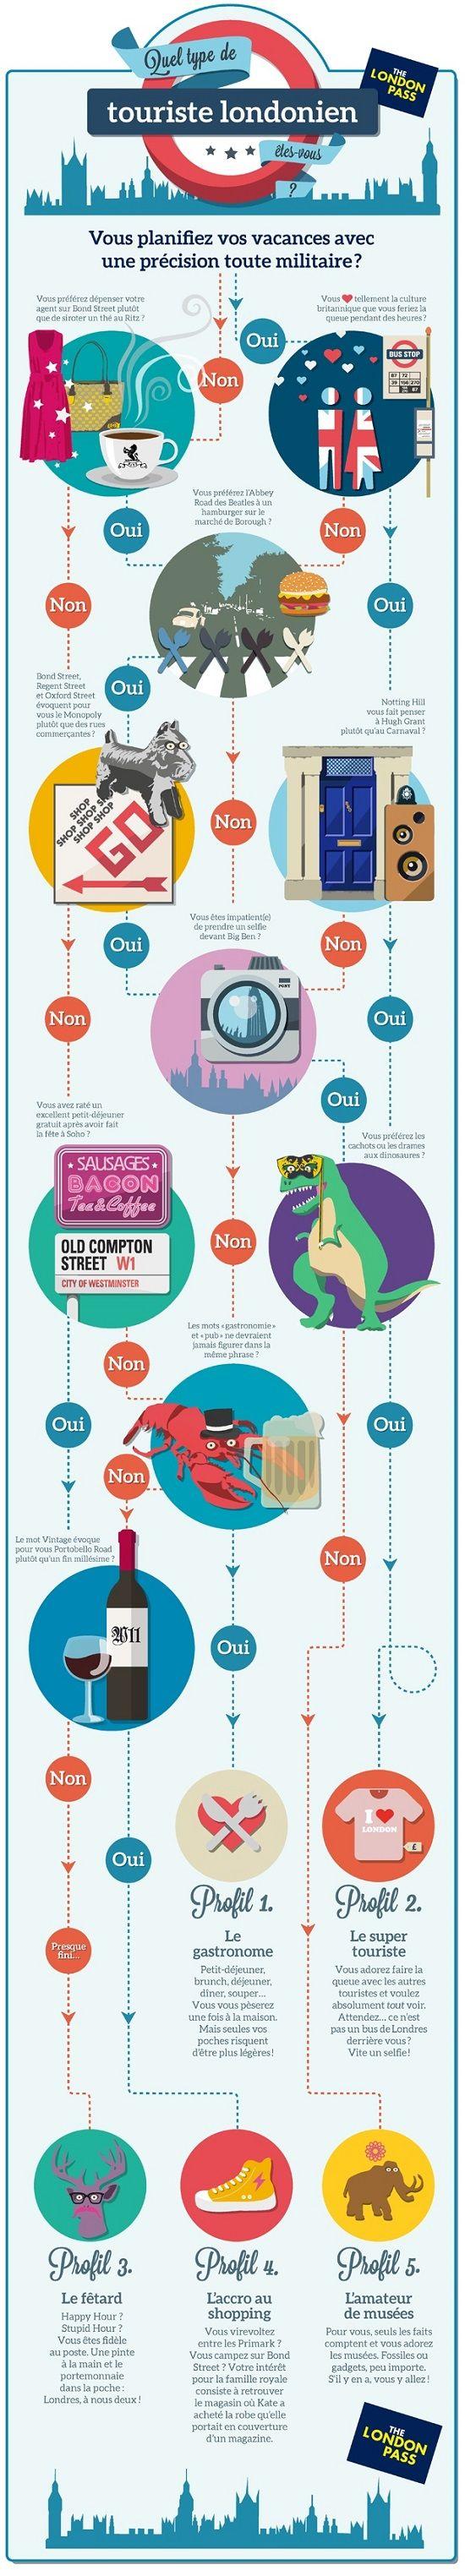 Infographie - LondonPass.fr